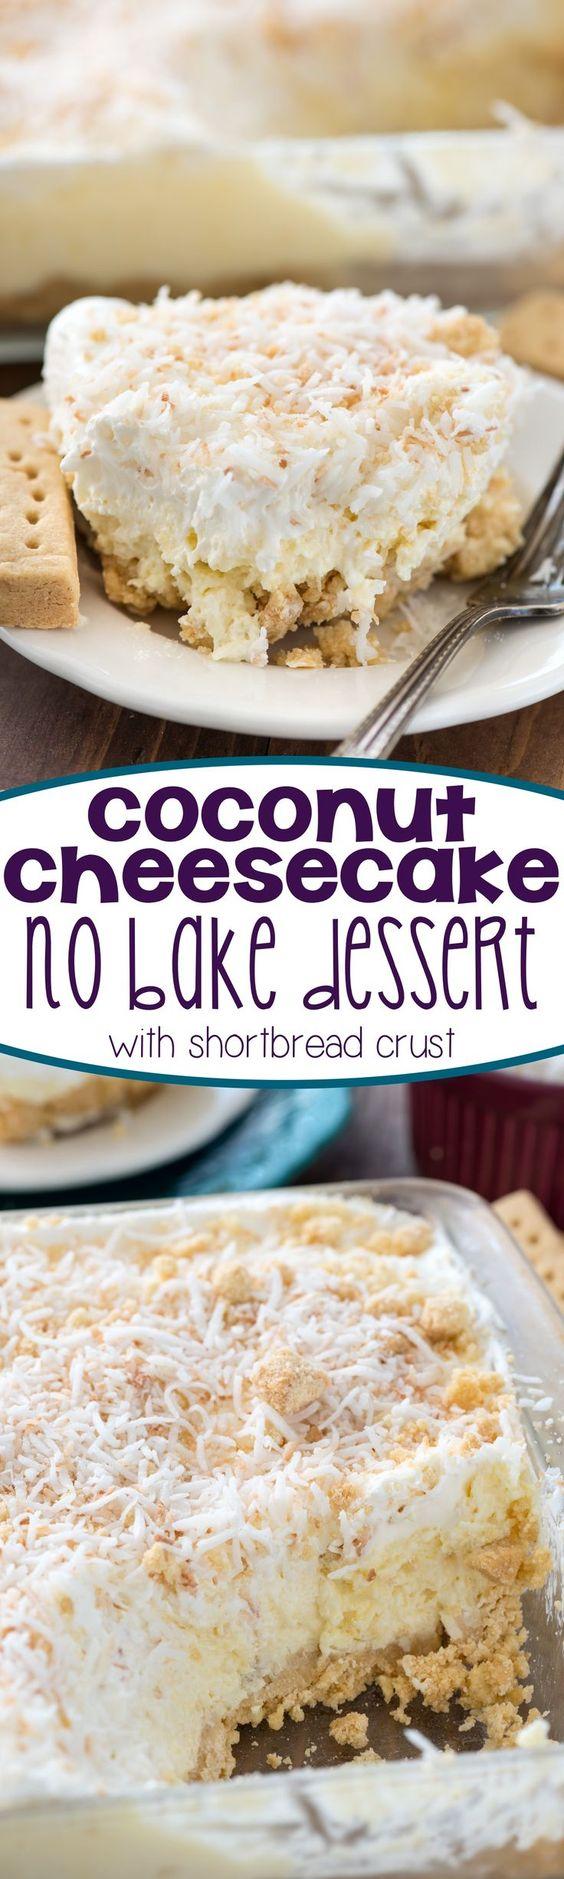 crust coconut lush desserts crusts recipes for recipe vanilla pudding ...